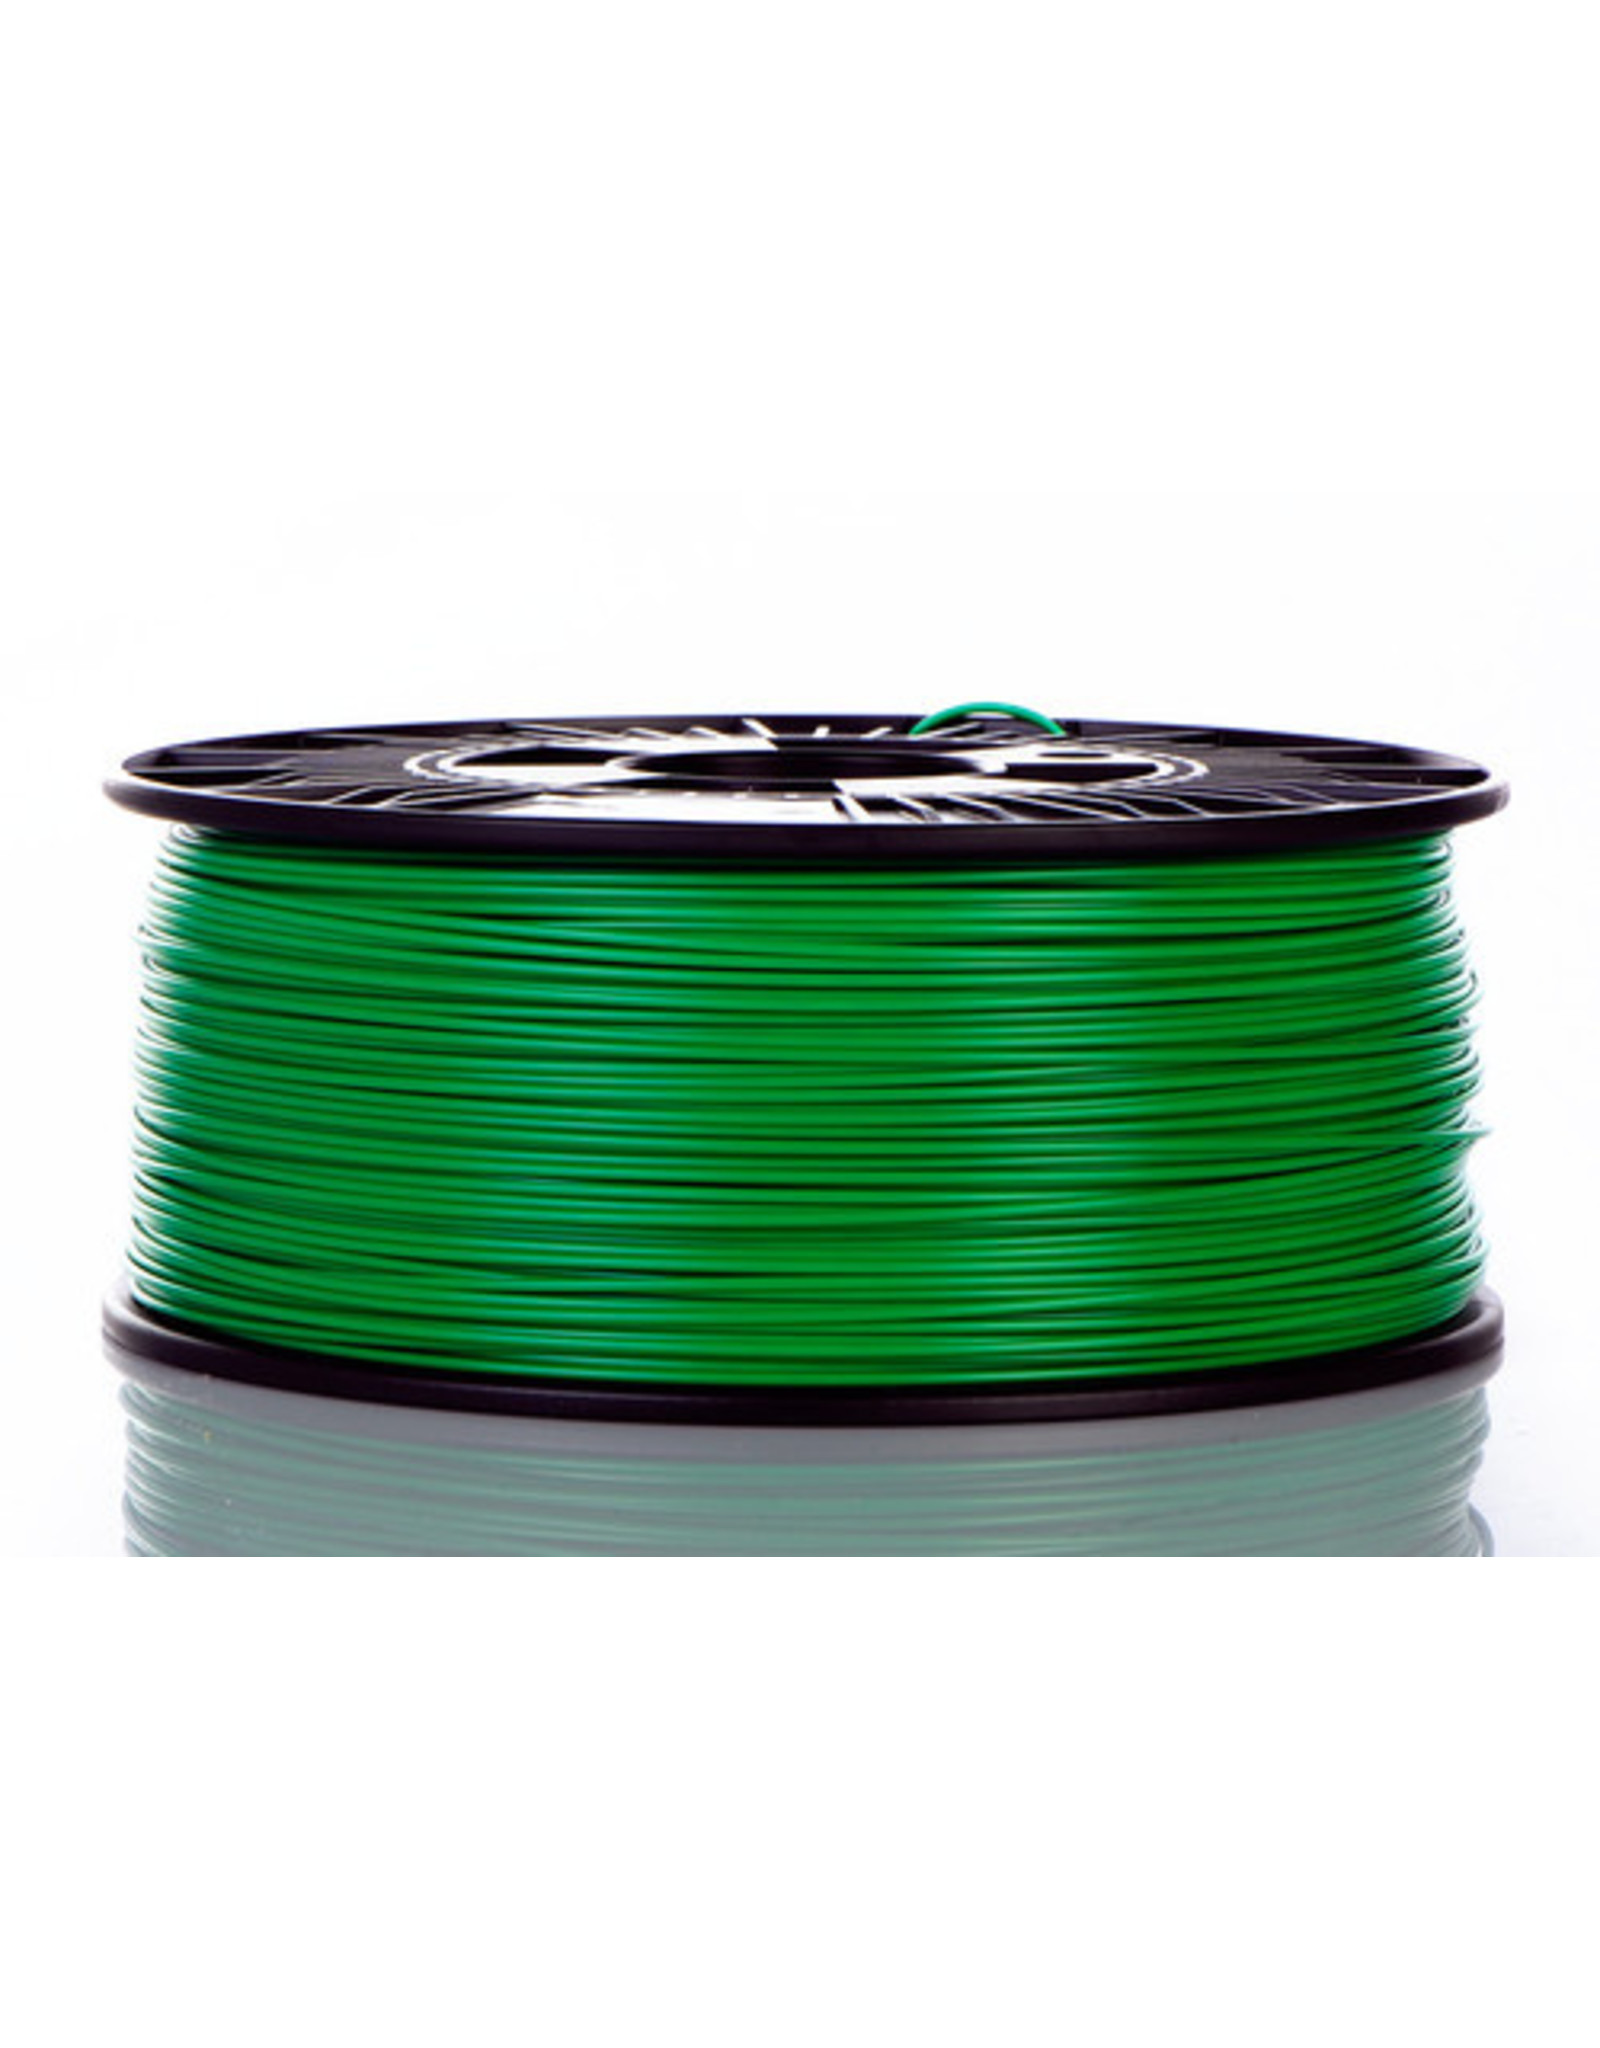 Material4Print ABS Jager Groen 1.75mm 1kg